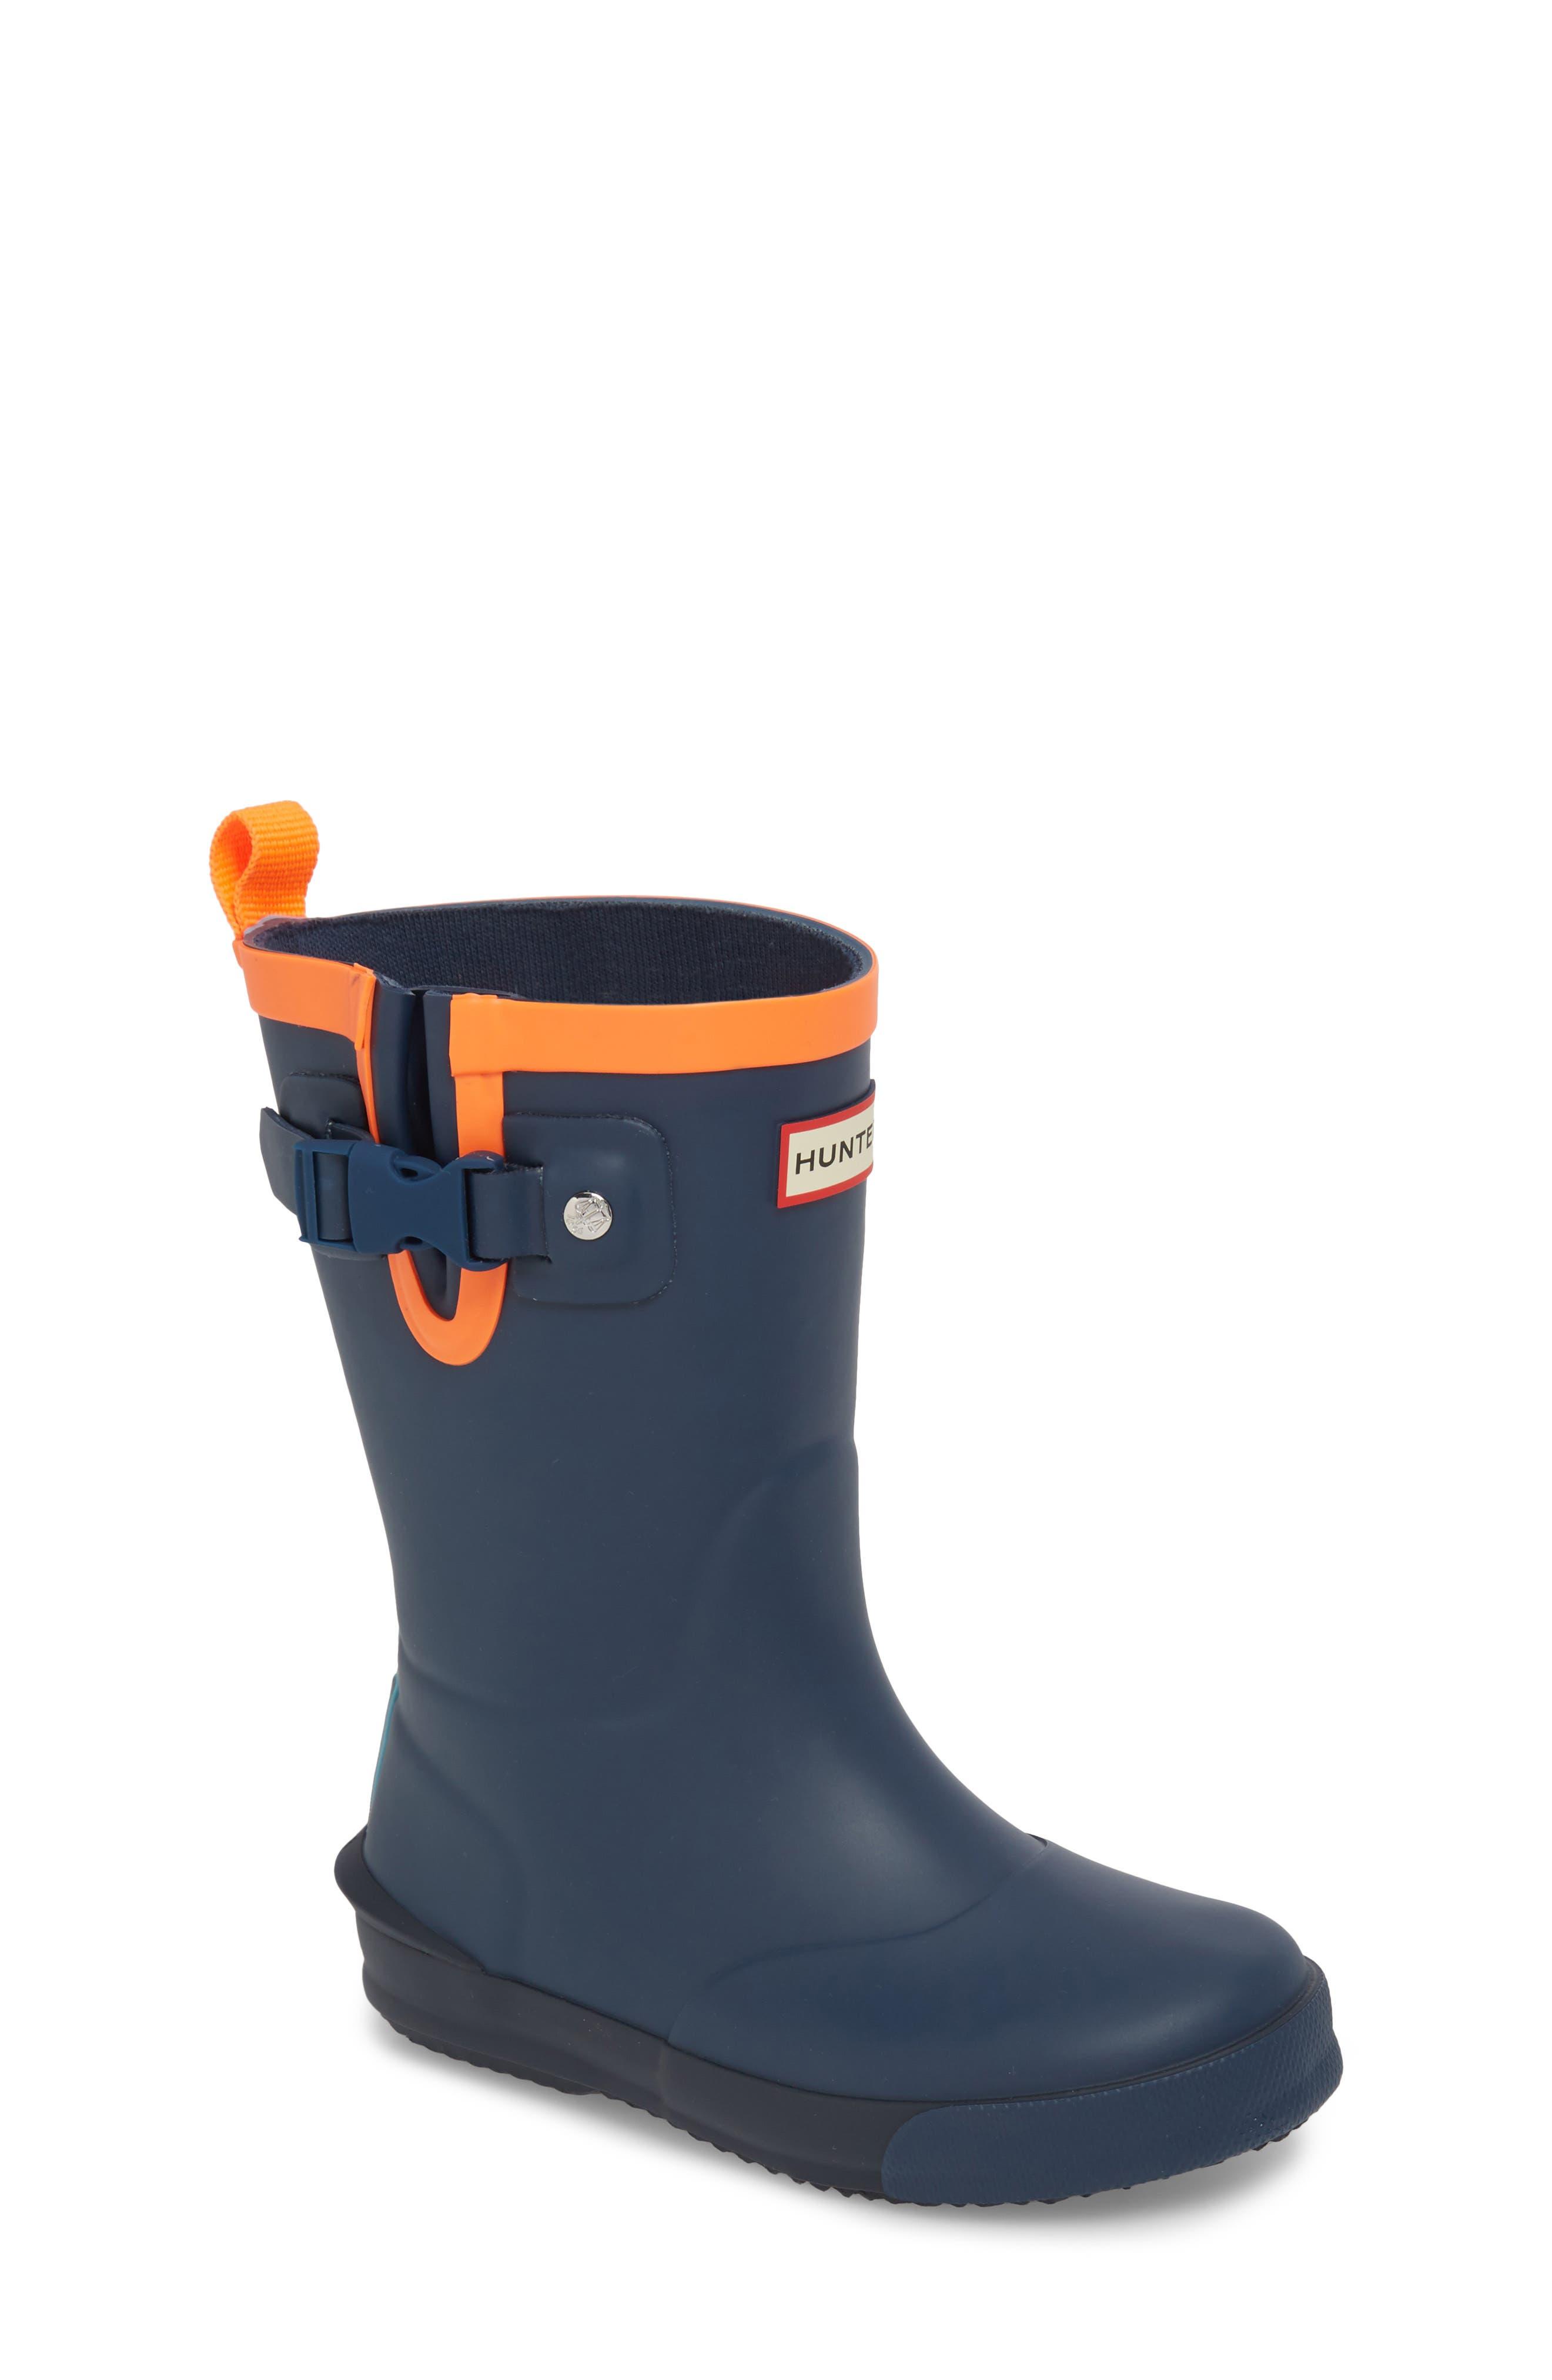 'Davison' Rain Boot,                         Main,                         color, Dark Lake Blue/ Navy/ Hazard